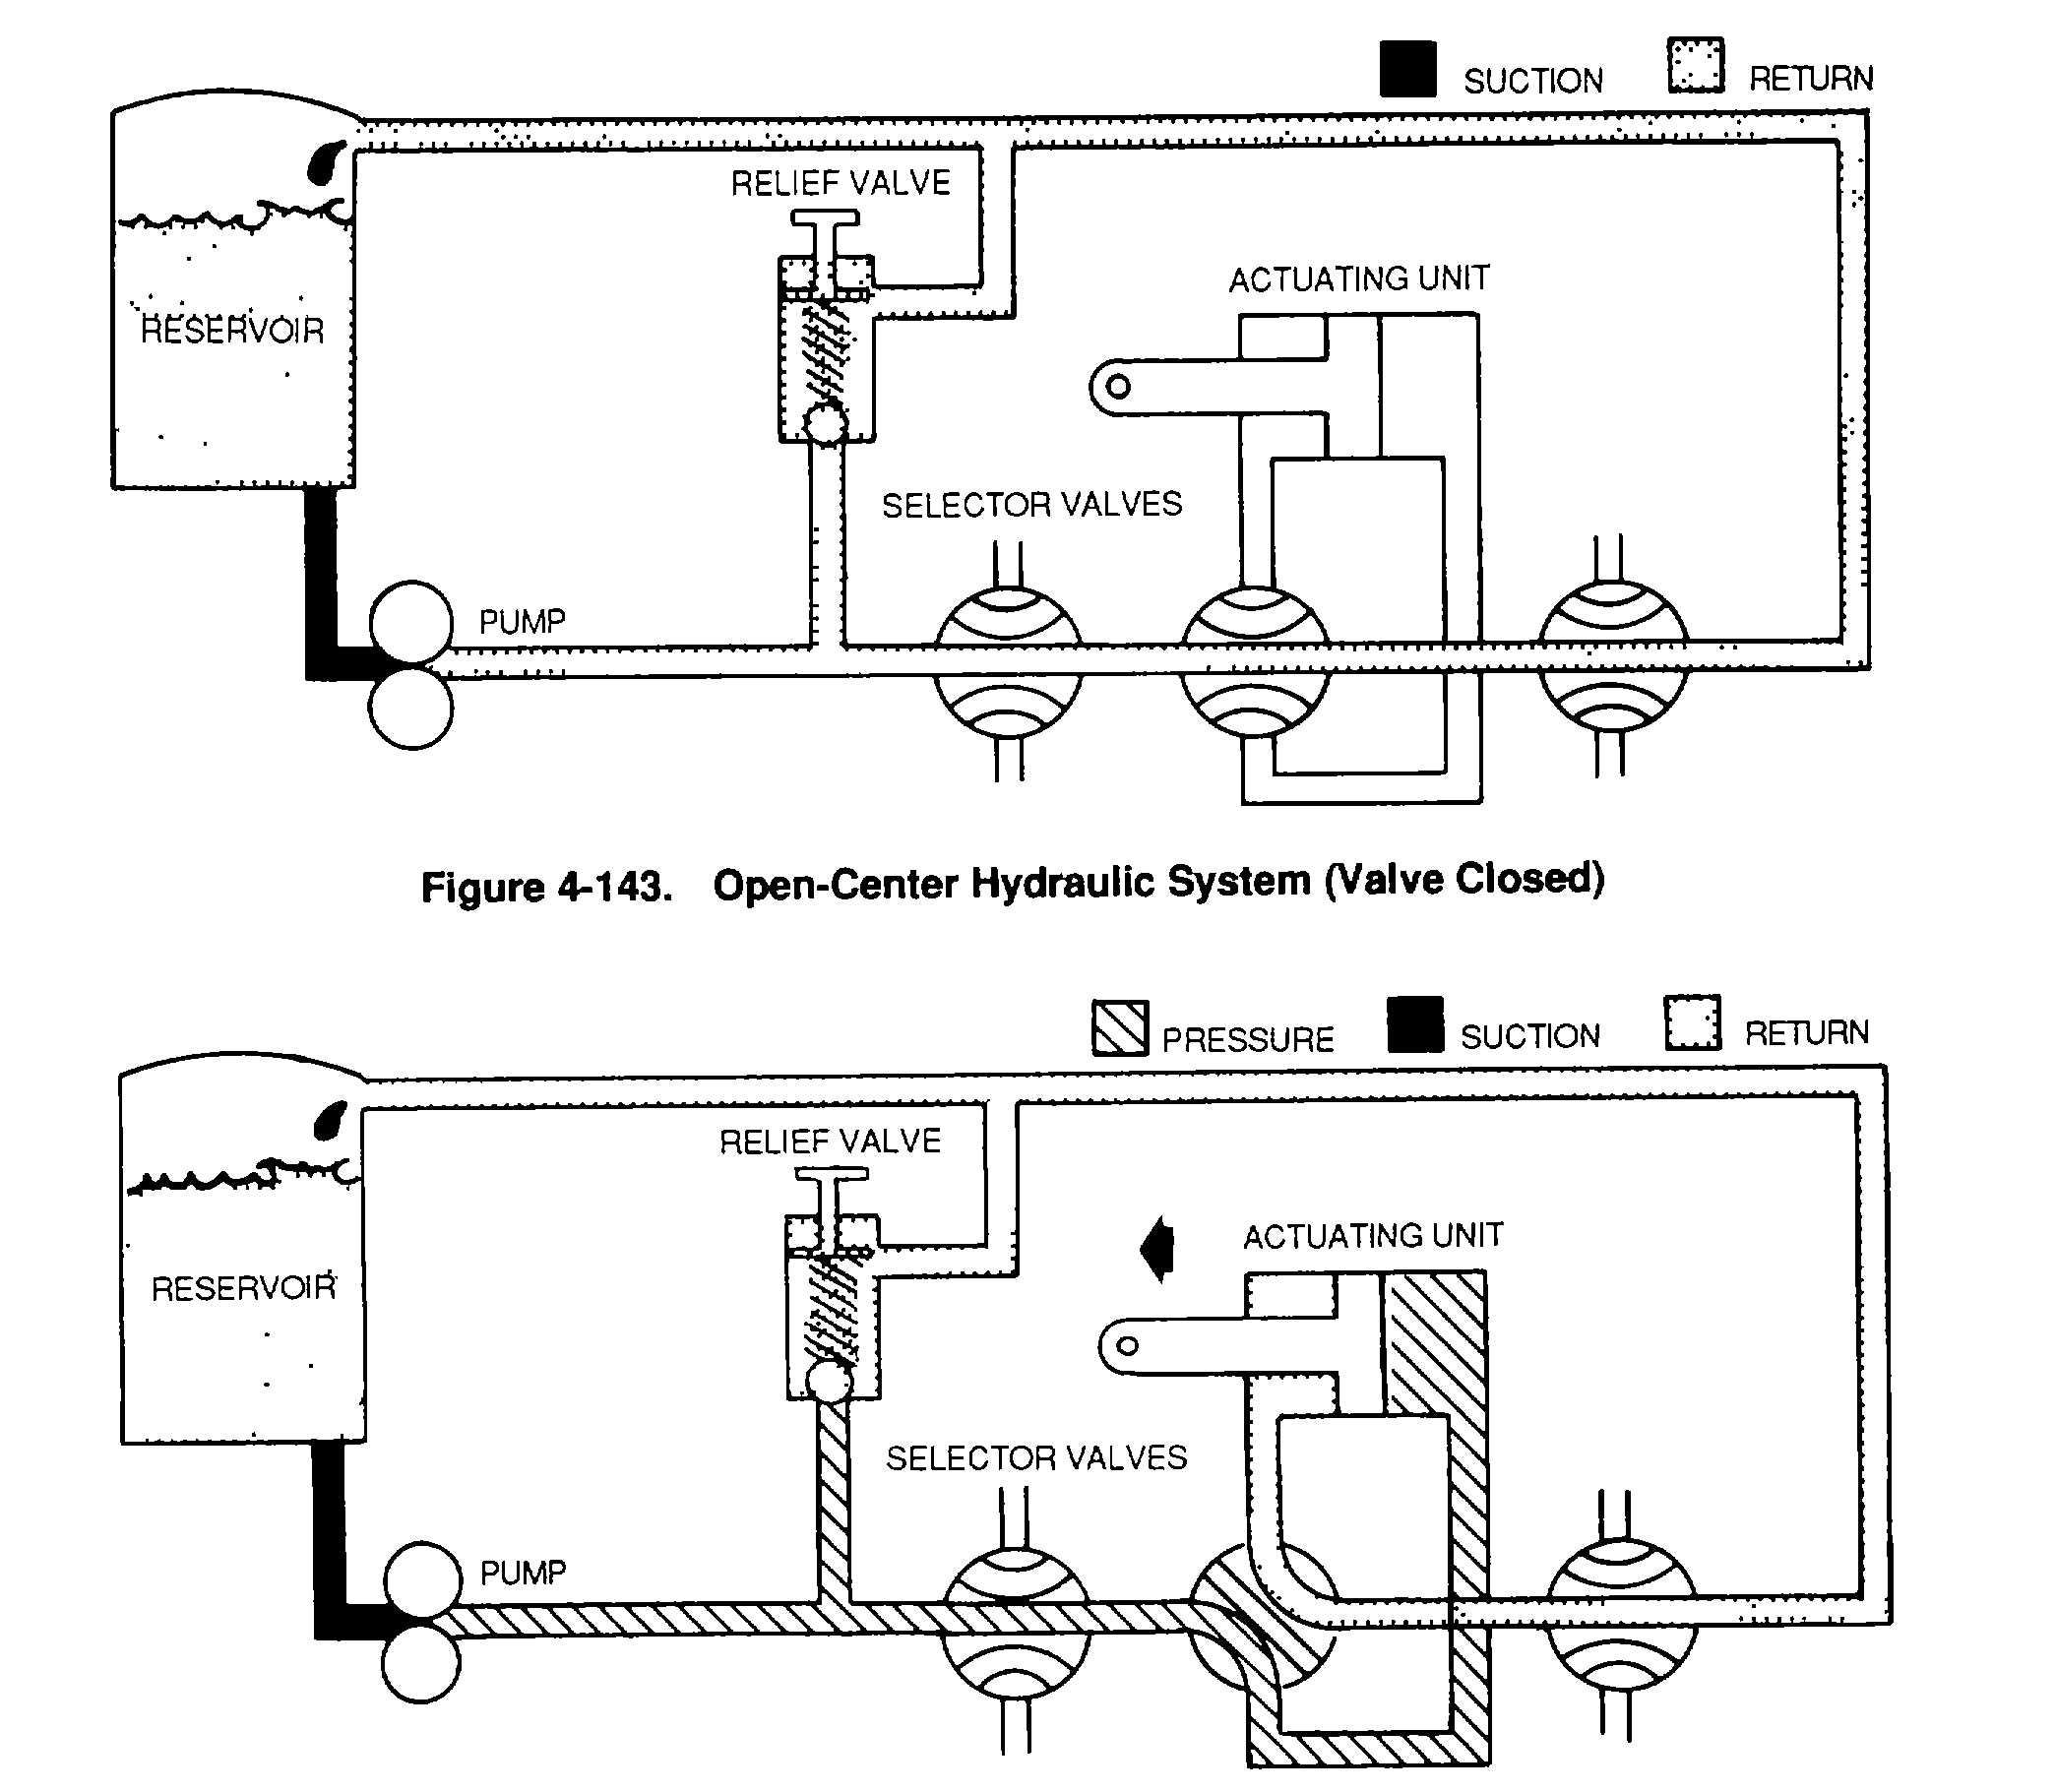 Hydraulic    solenoid Valve    Wiring       Diagram      Free    Wiring       Diagram